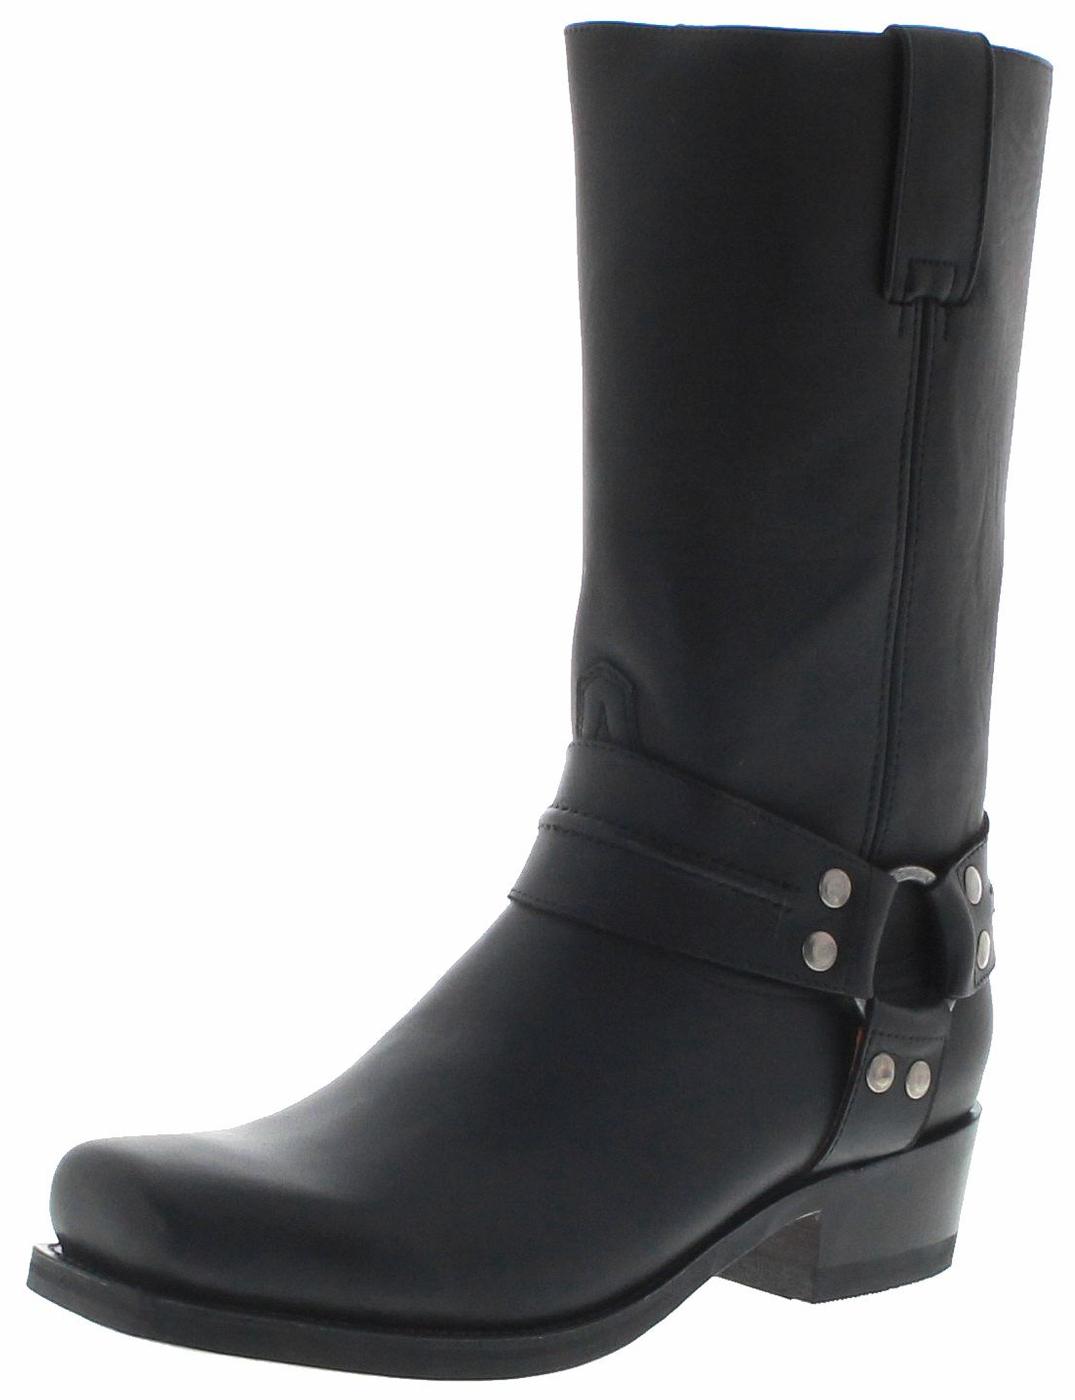 FB Fashion Boots BLUES HIGH Pull Negro Biker Boots - black